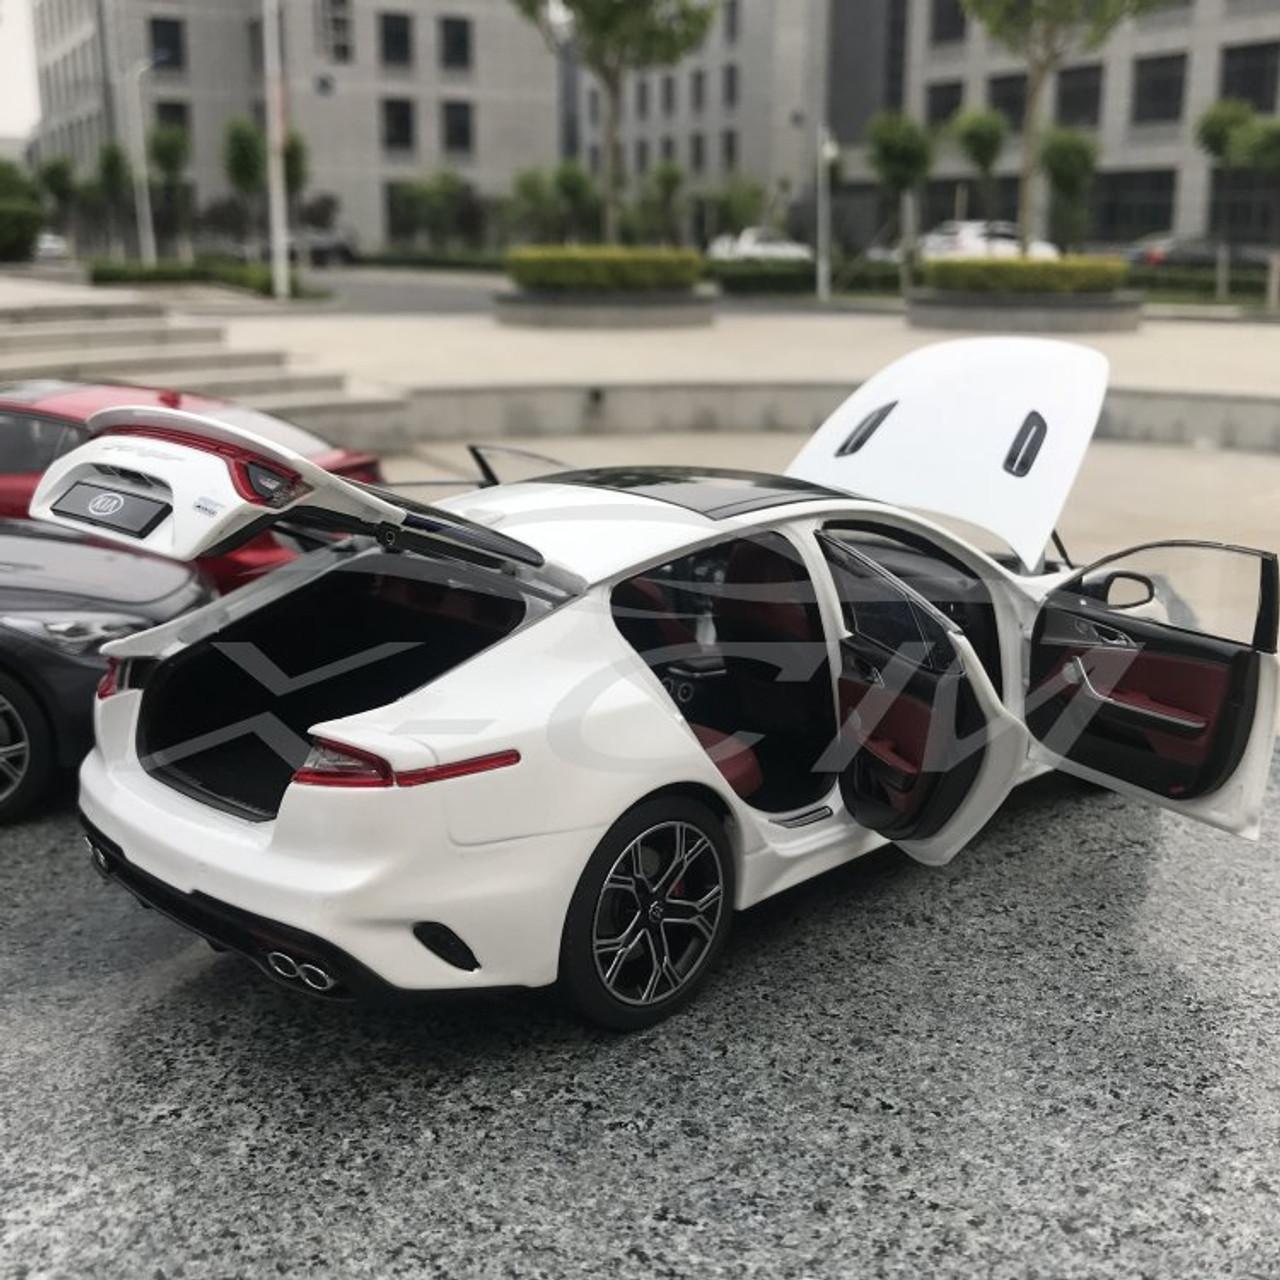 1/18 Dealer Edition Kia Stinger US Version (White) Diecast Model